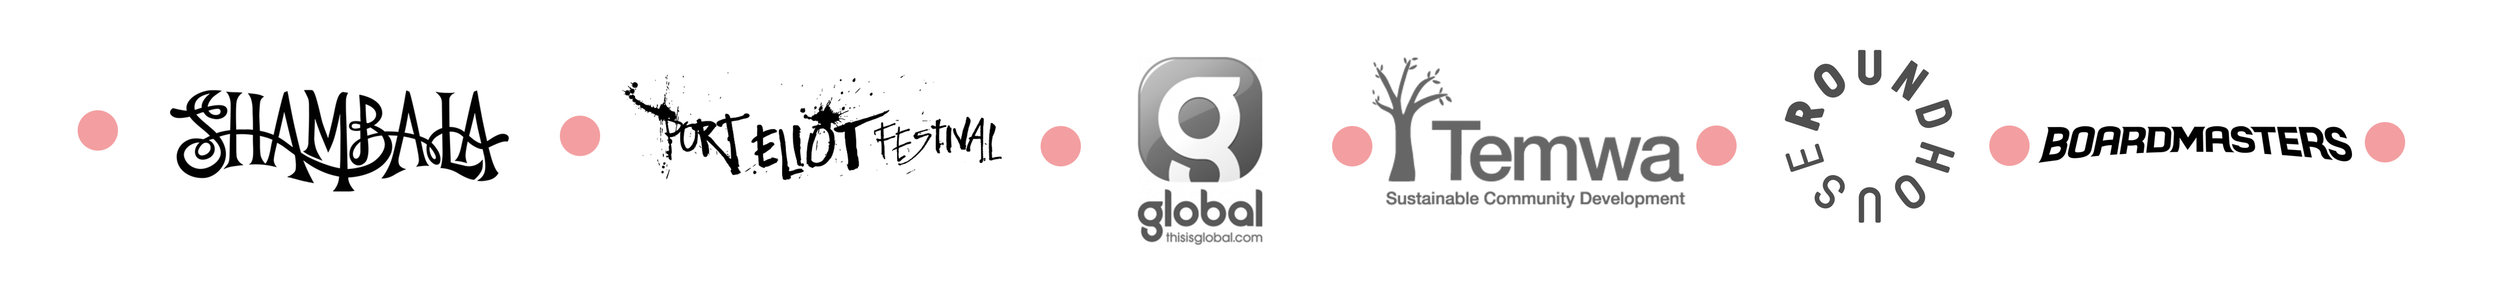 logo sheet 2.jpg